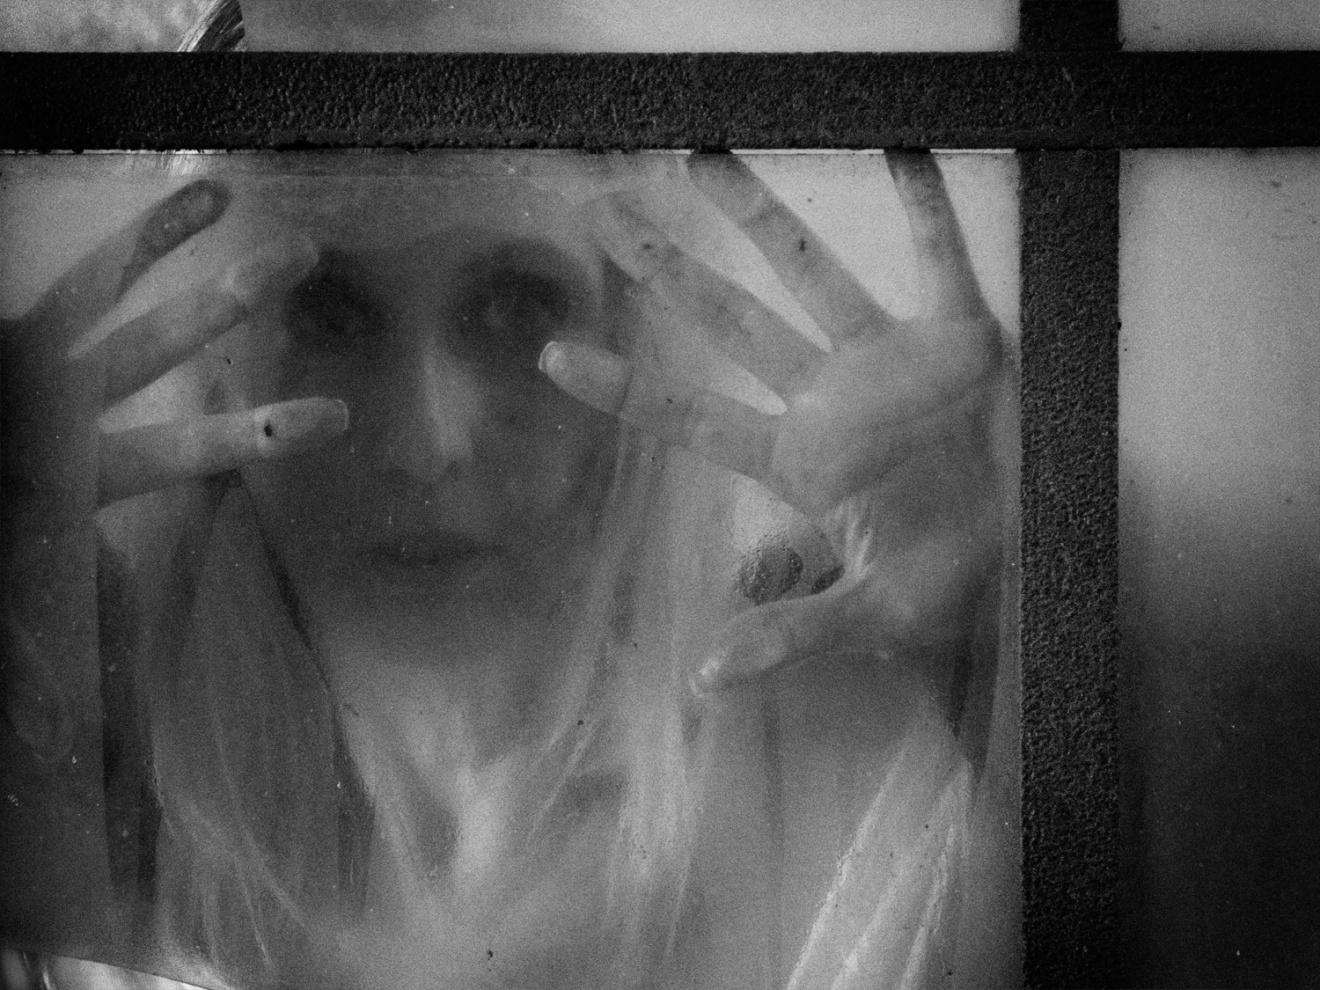 Tears behind the window